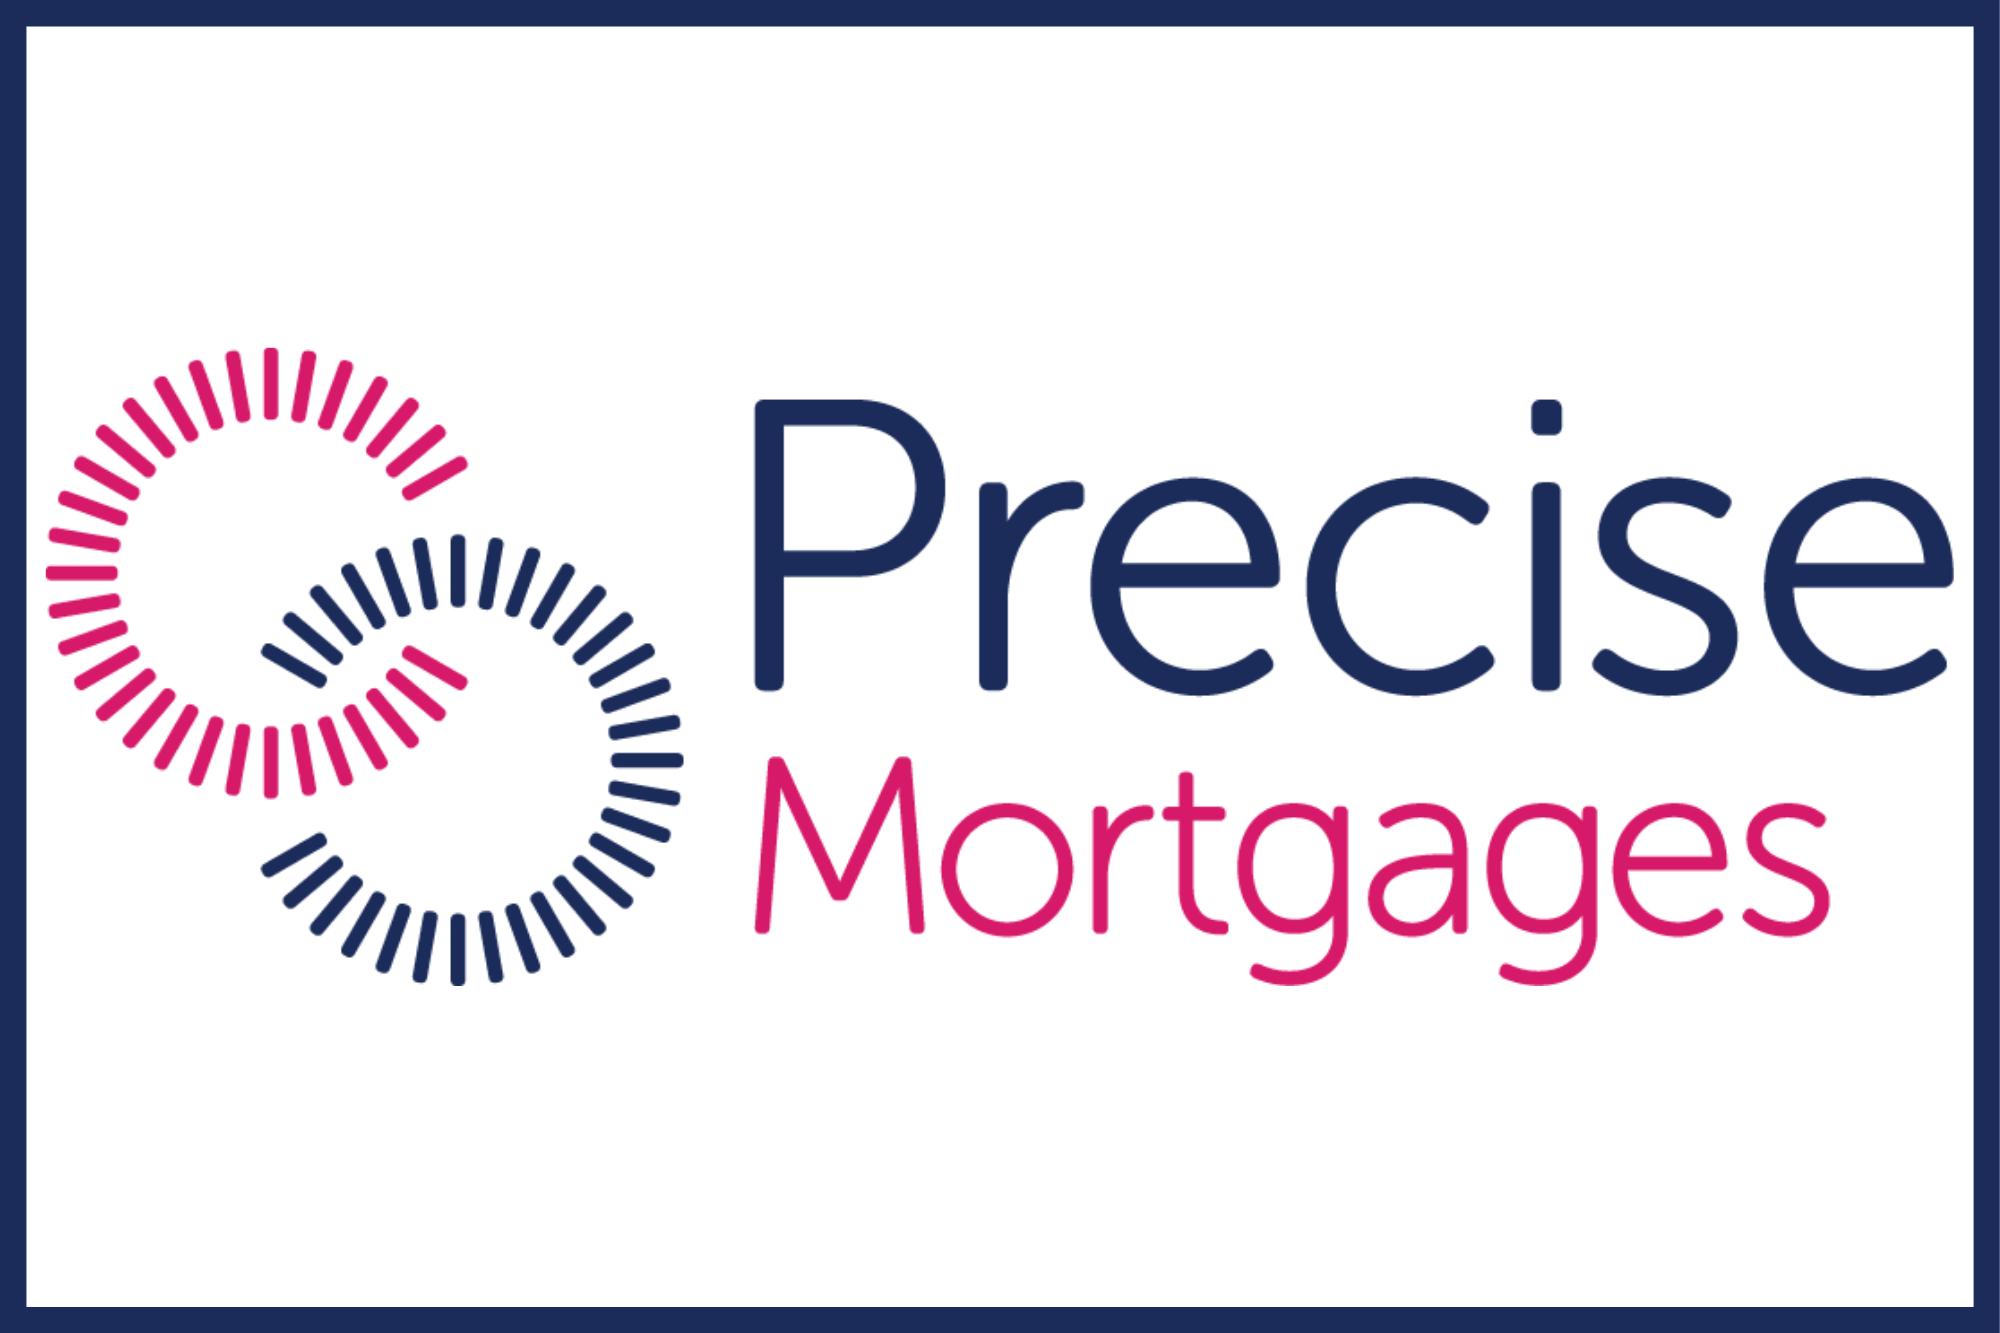 Precise Mortgages